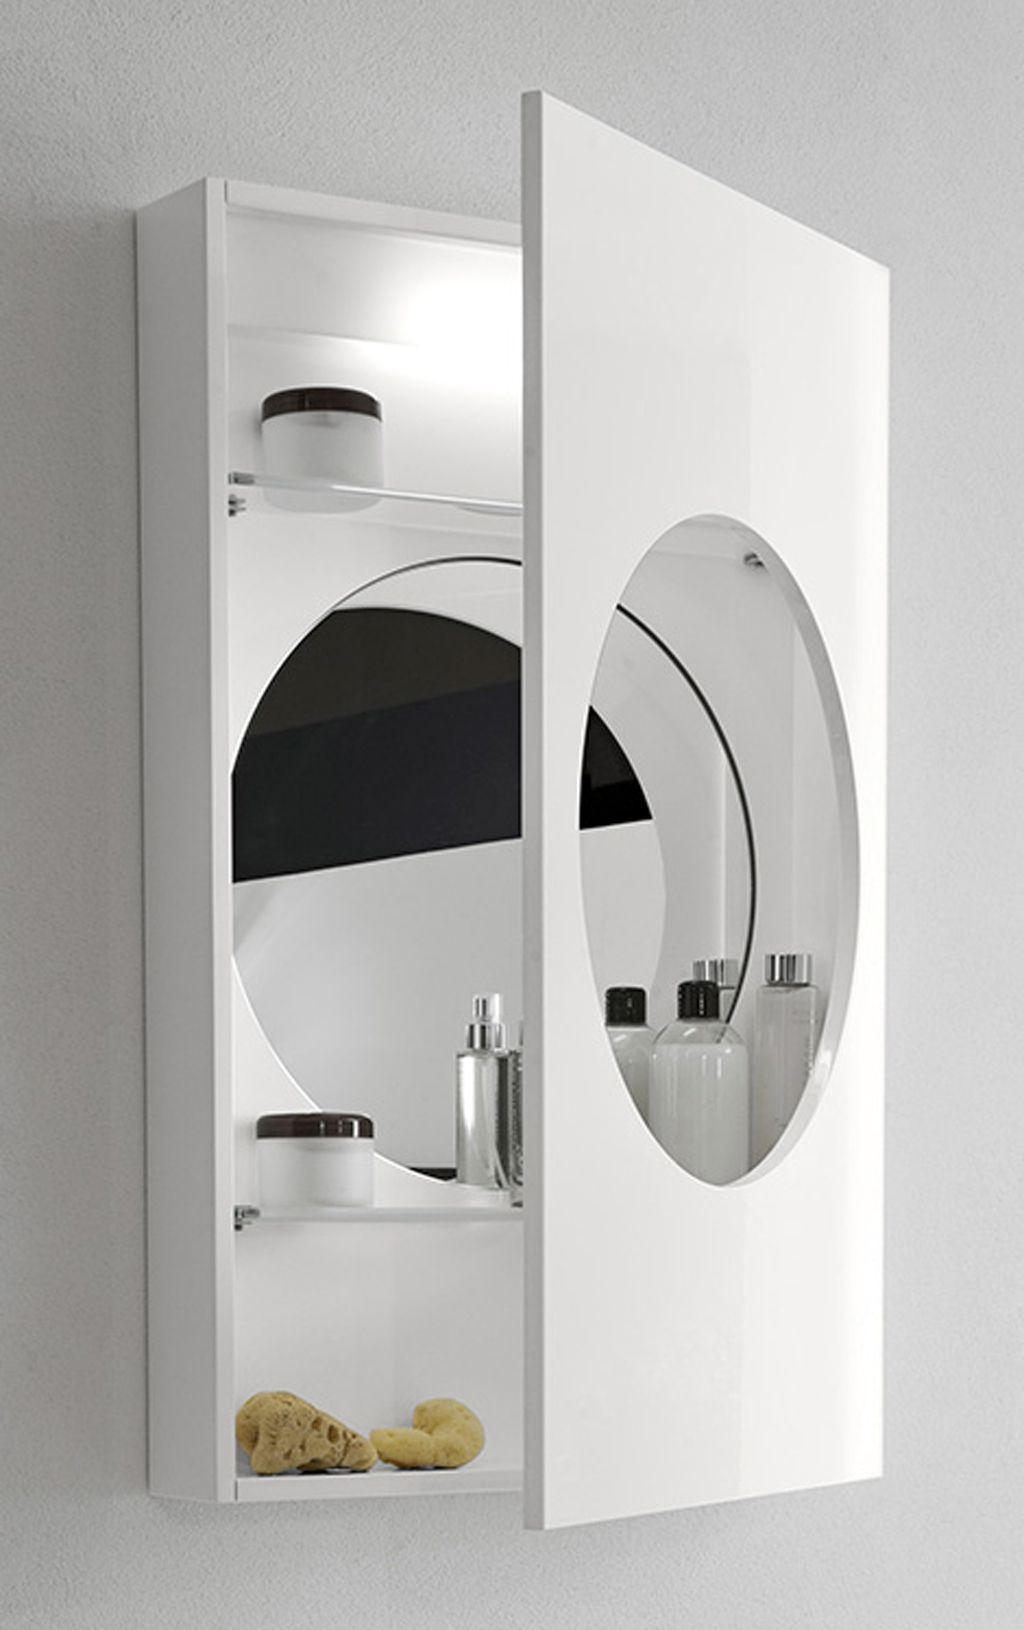 futuristic bathroom mirror cabinet designs | Shads series ...